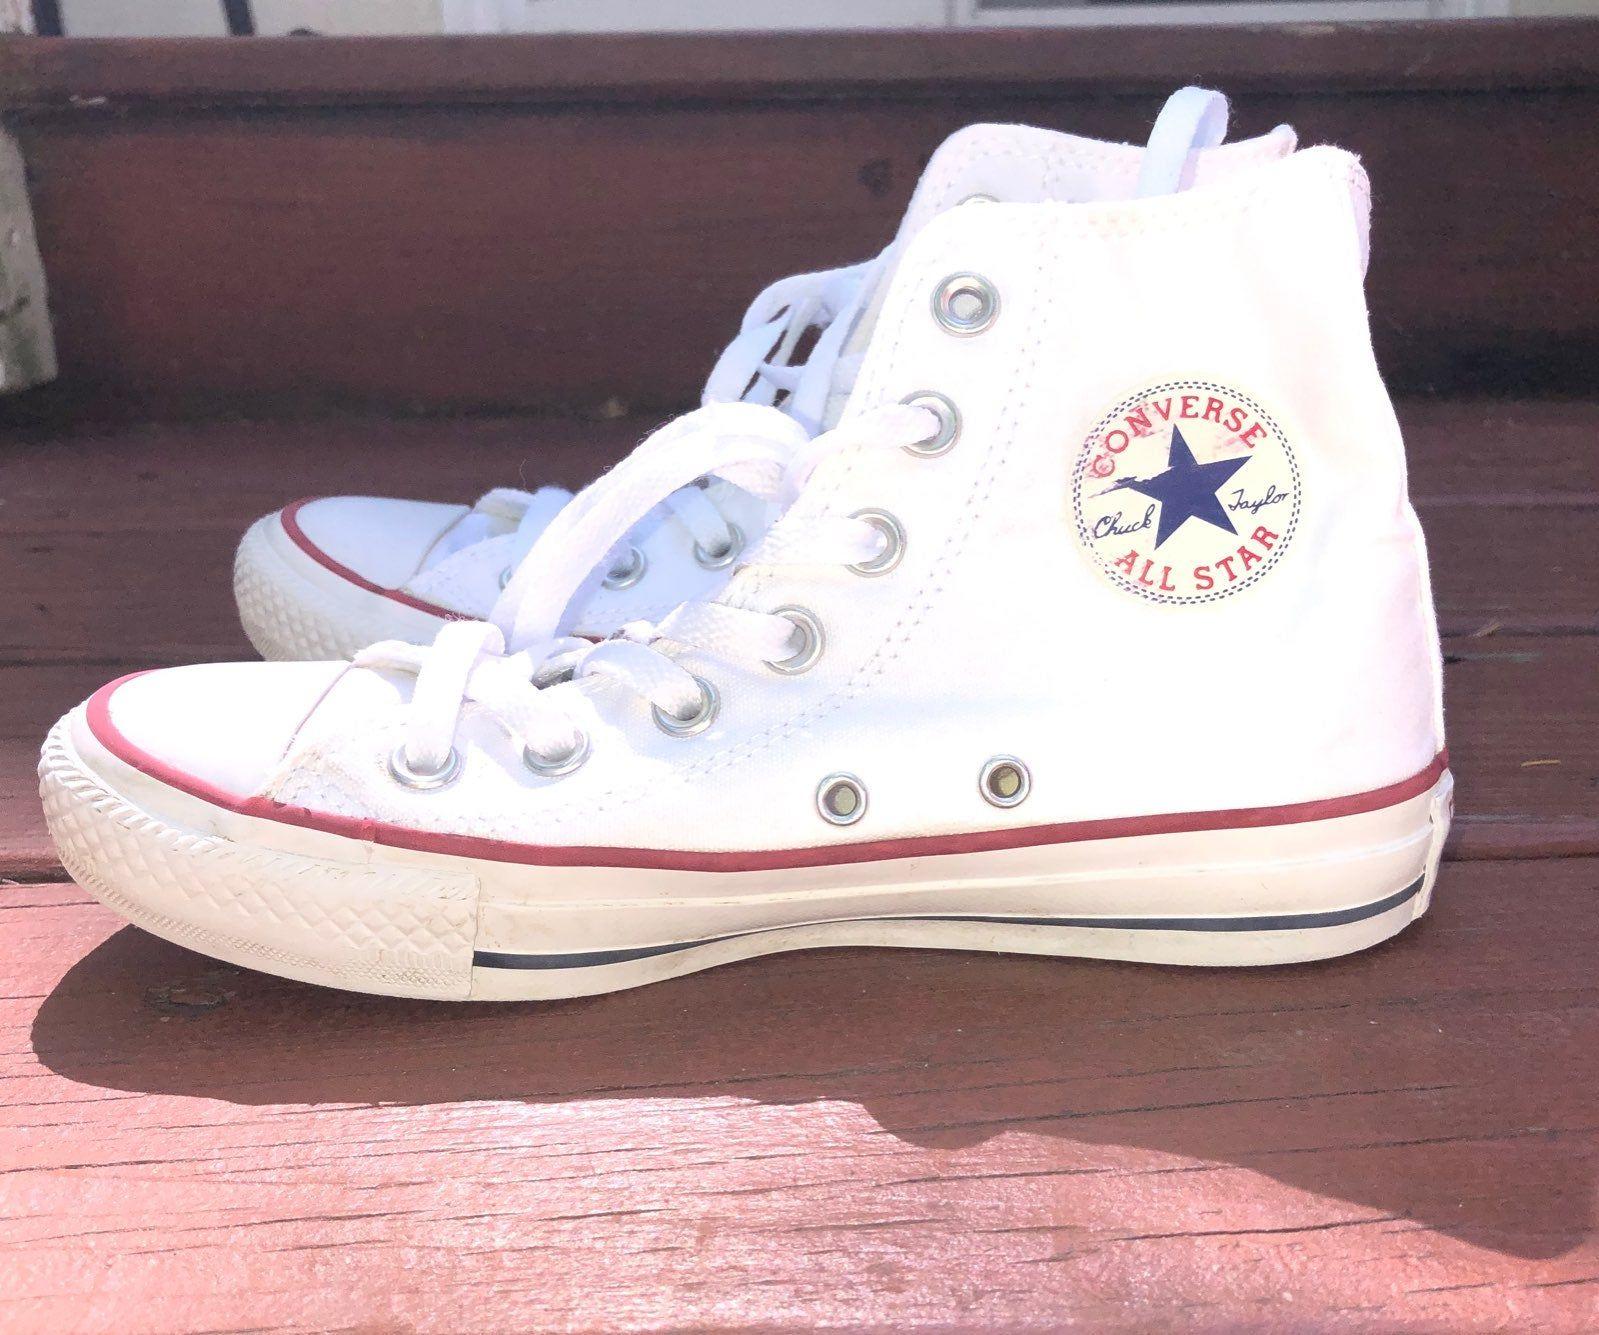 White high top converse women's size 5